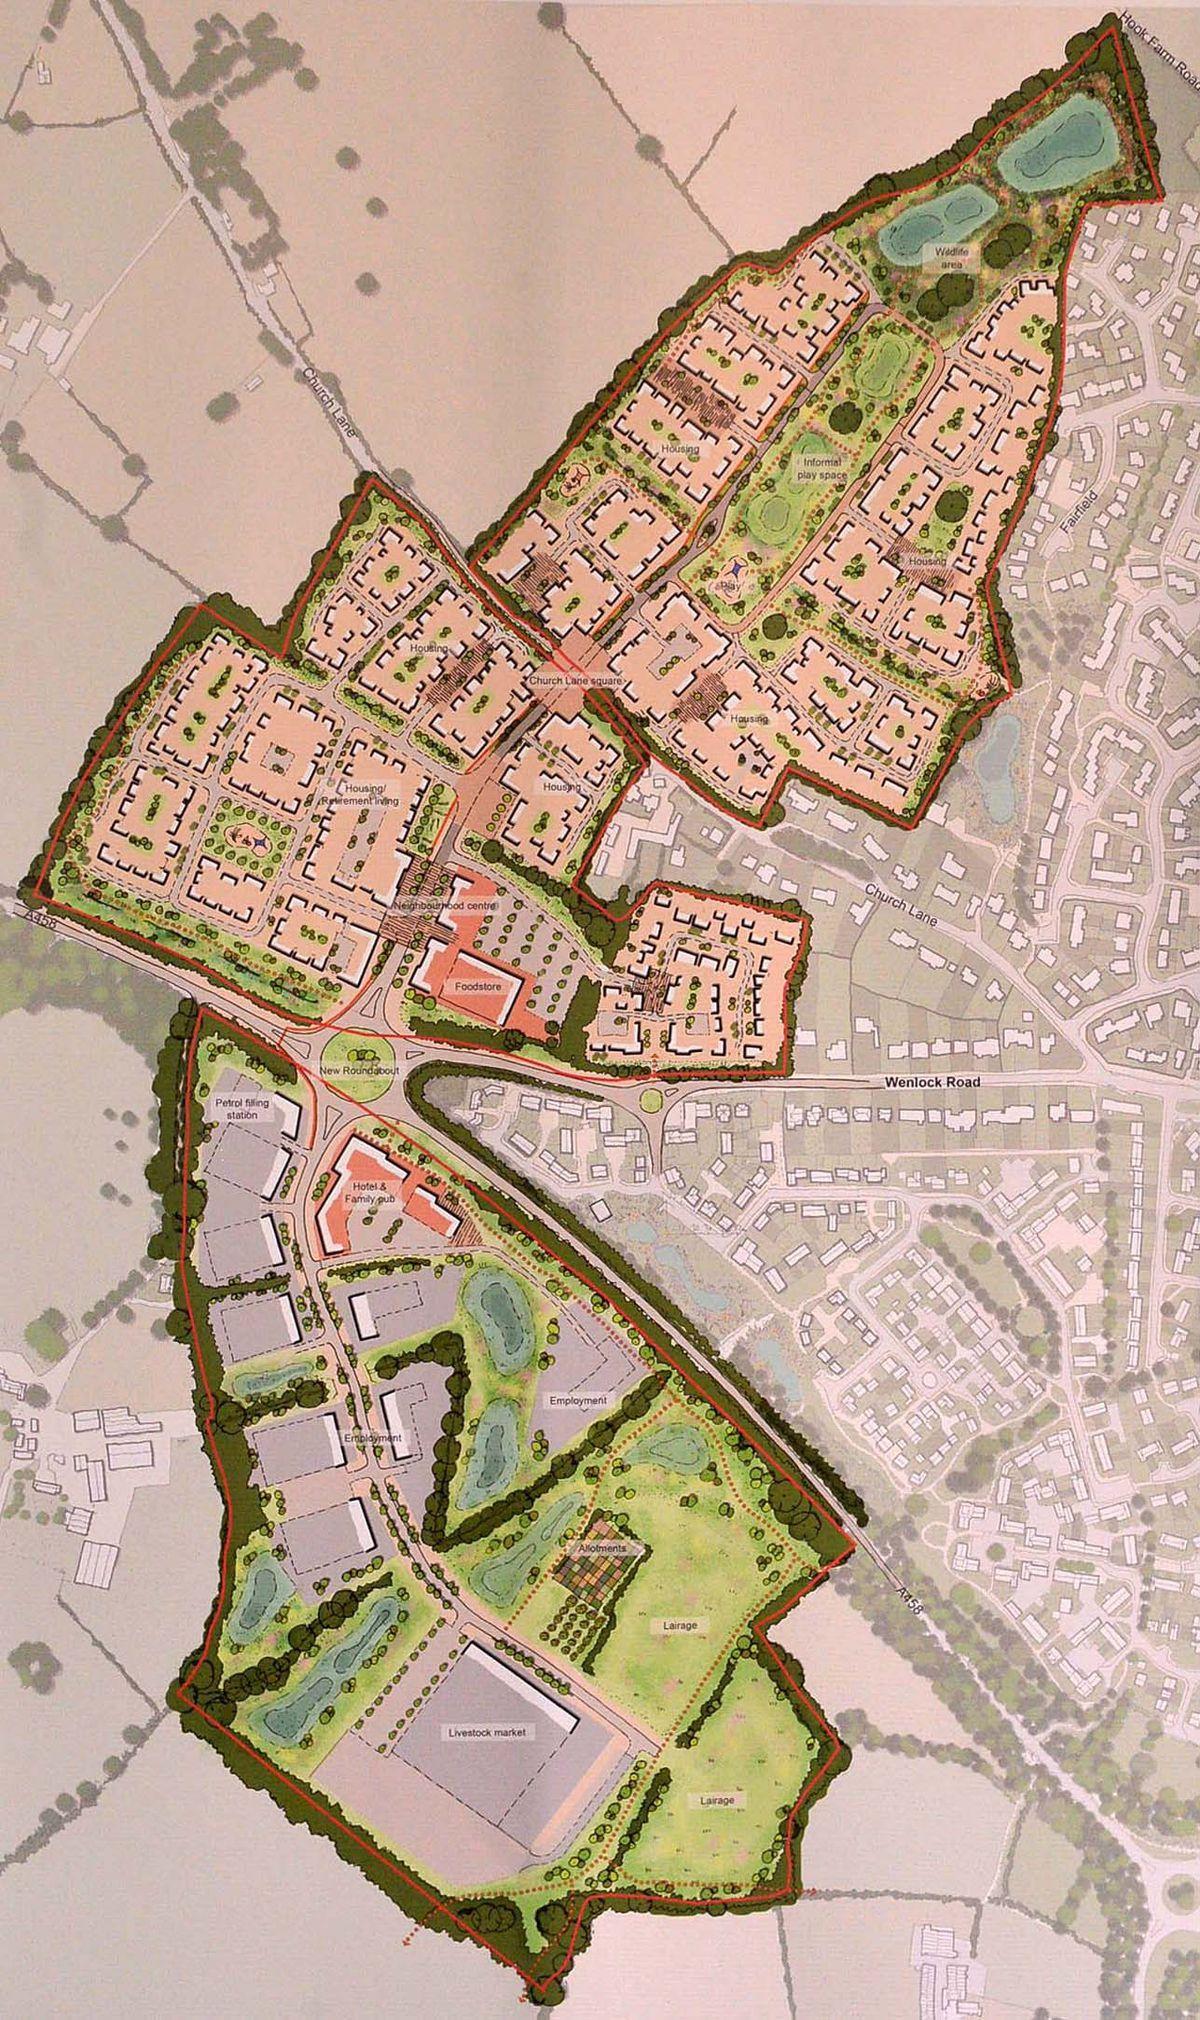 The masterplan for Tasley Gateway Development